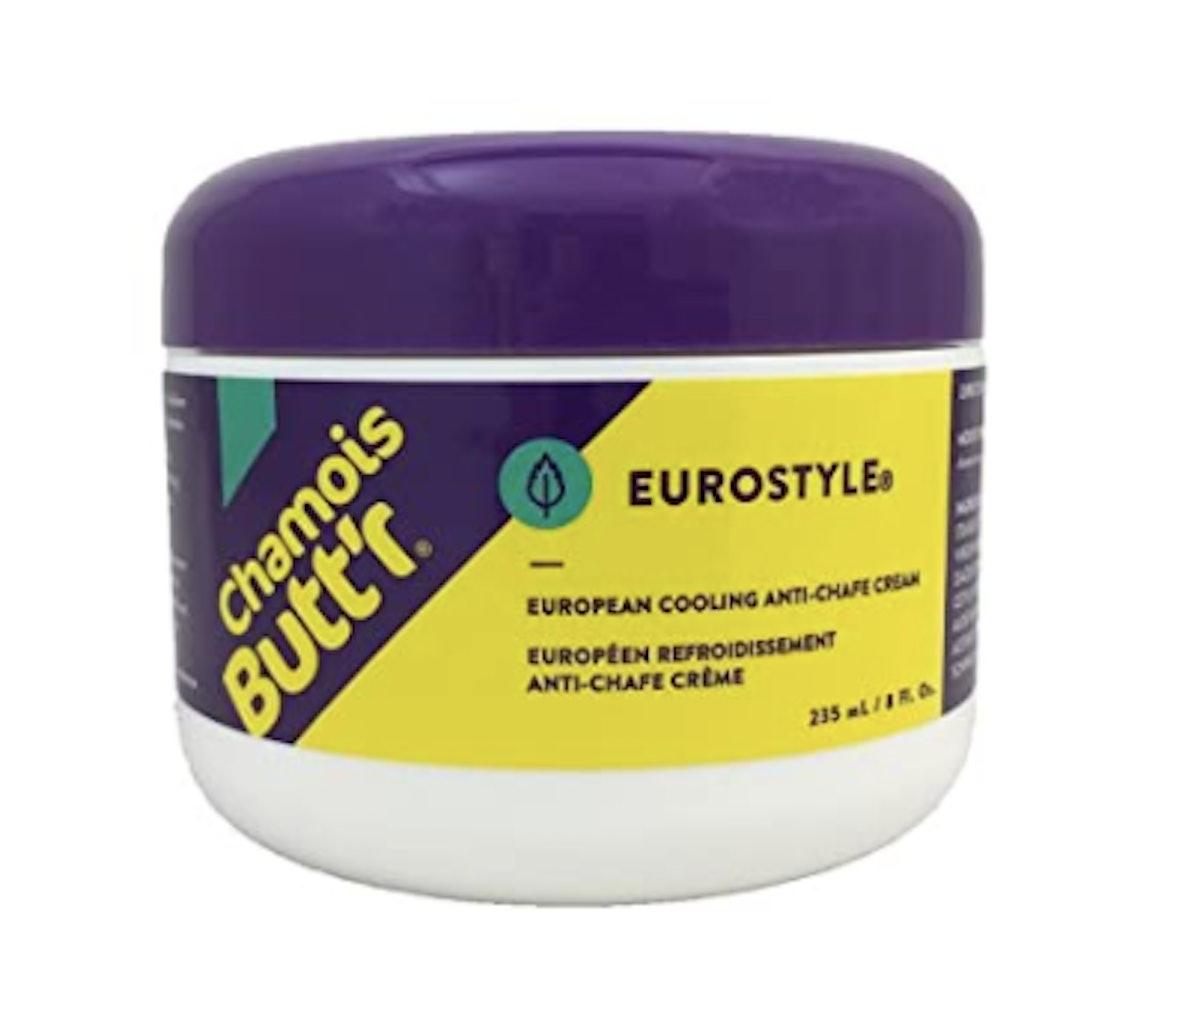 Chamois Butt'r Eurostyle Anti-Chafe Cream